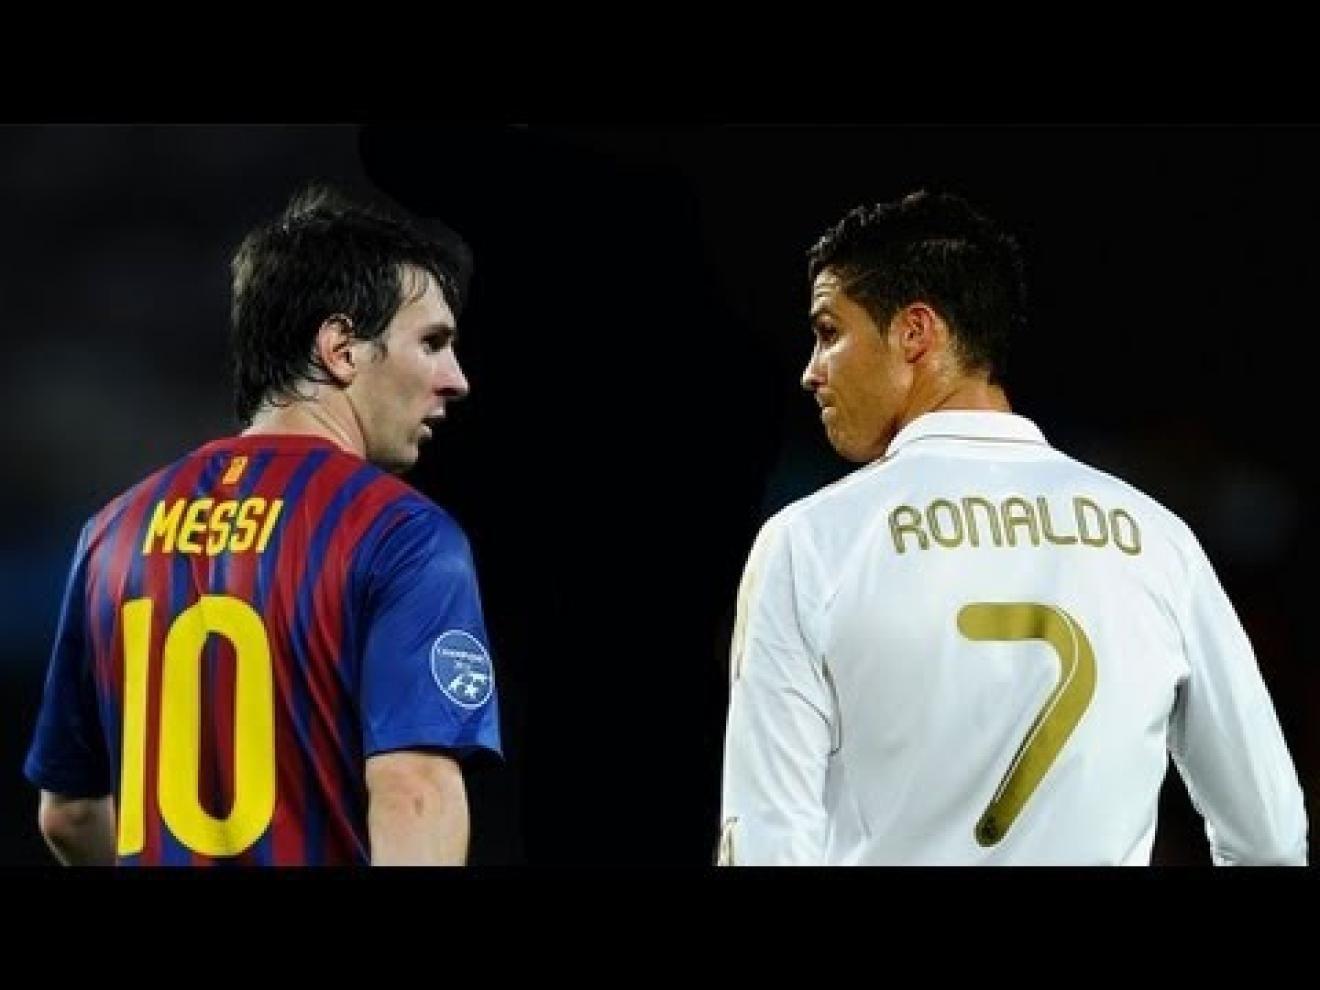 Messi Vs Ronaldo Wallpapers 2015 Hd Wallpaper Cave Messi